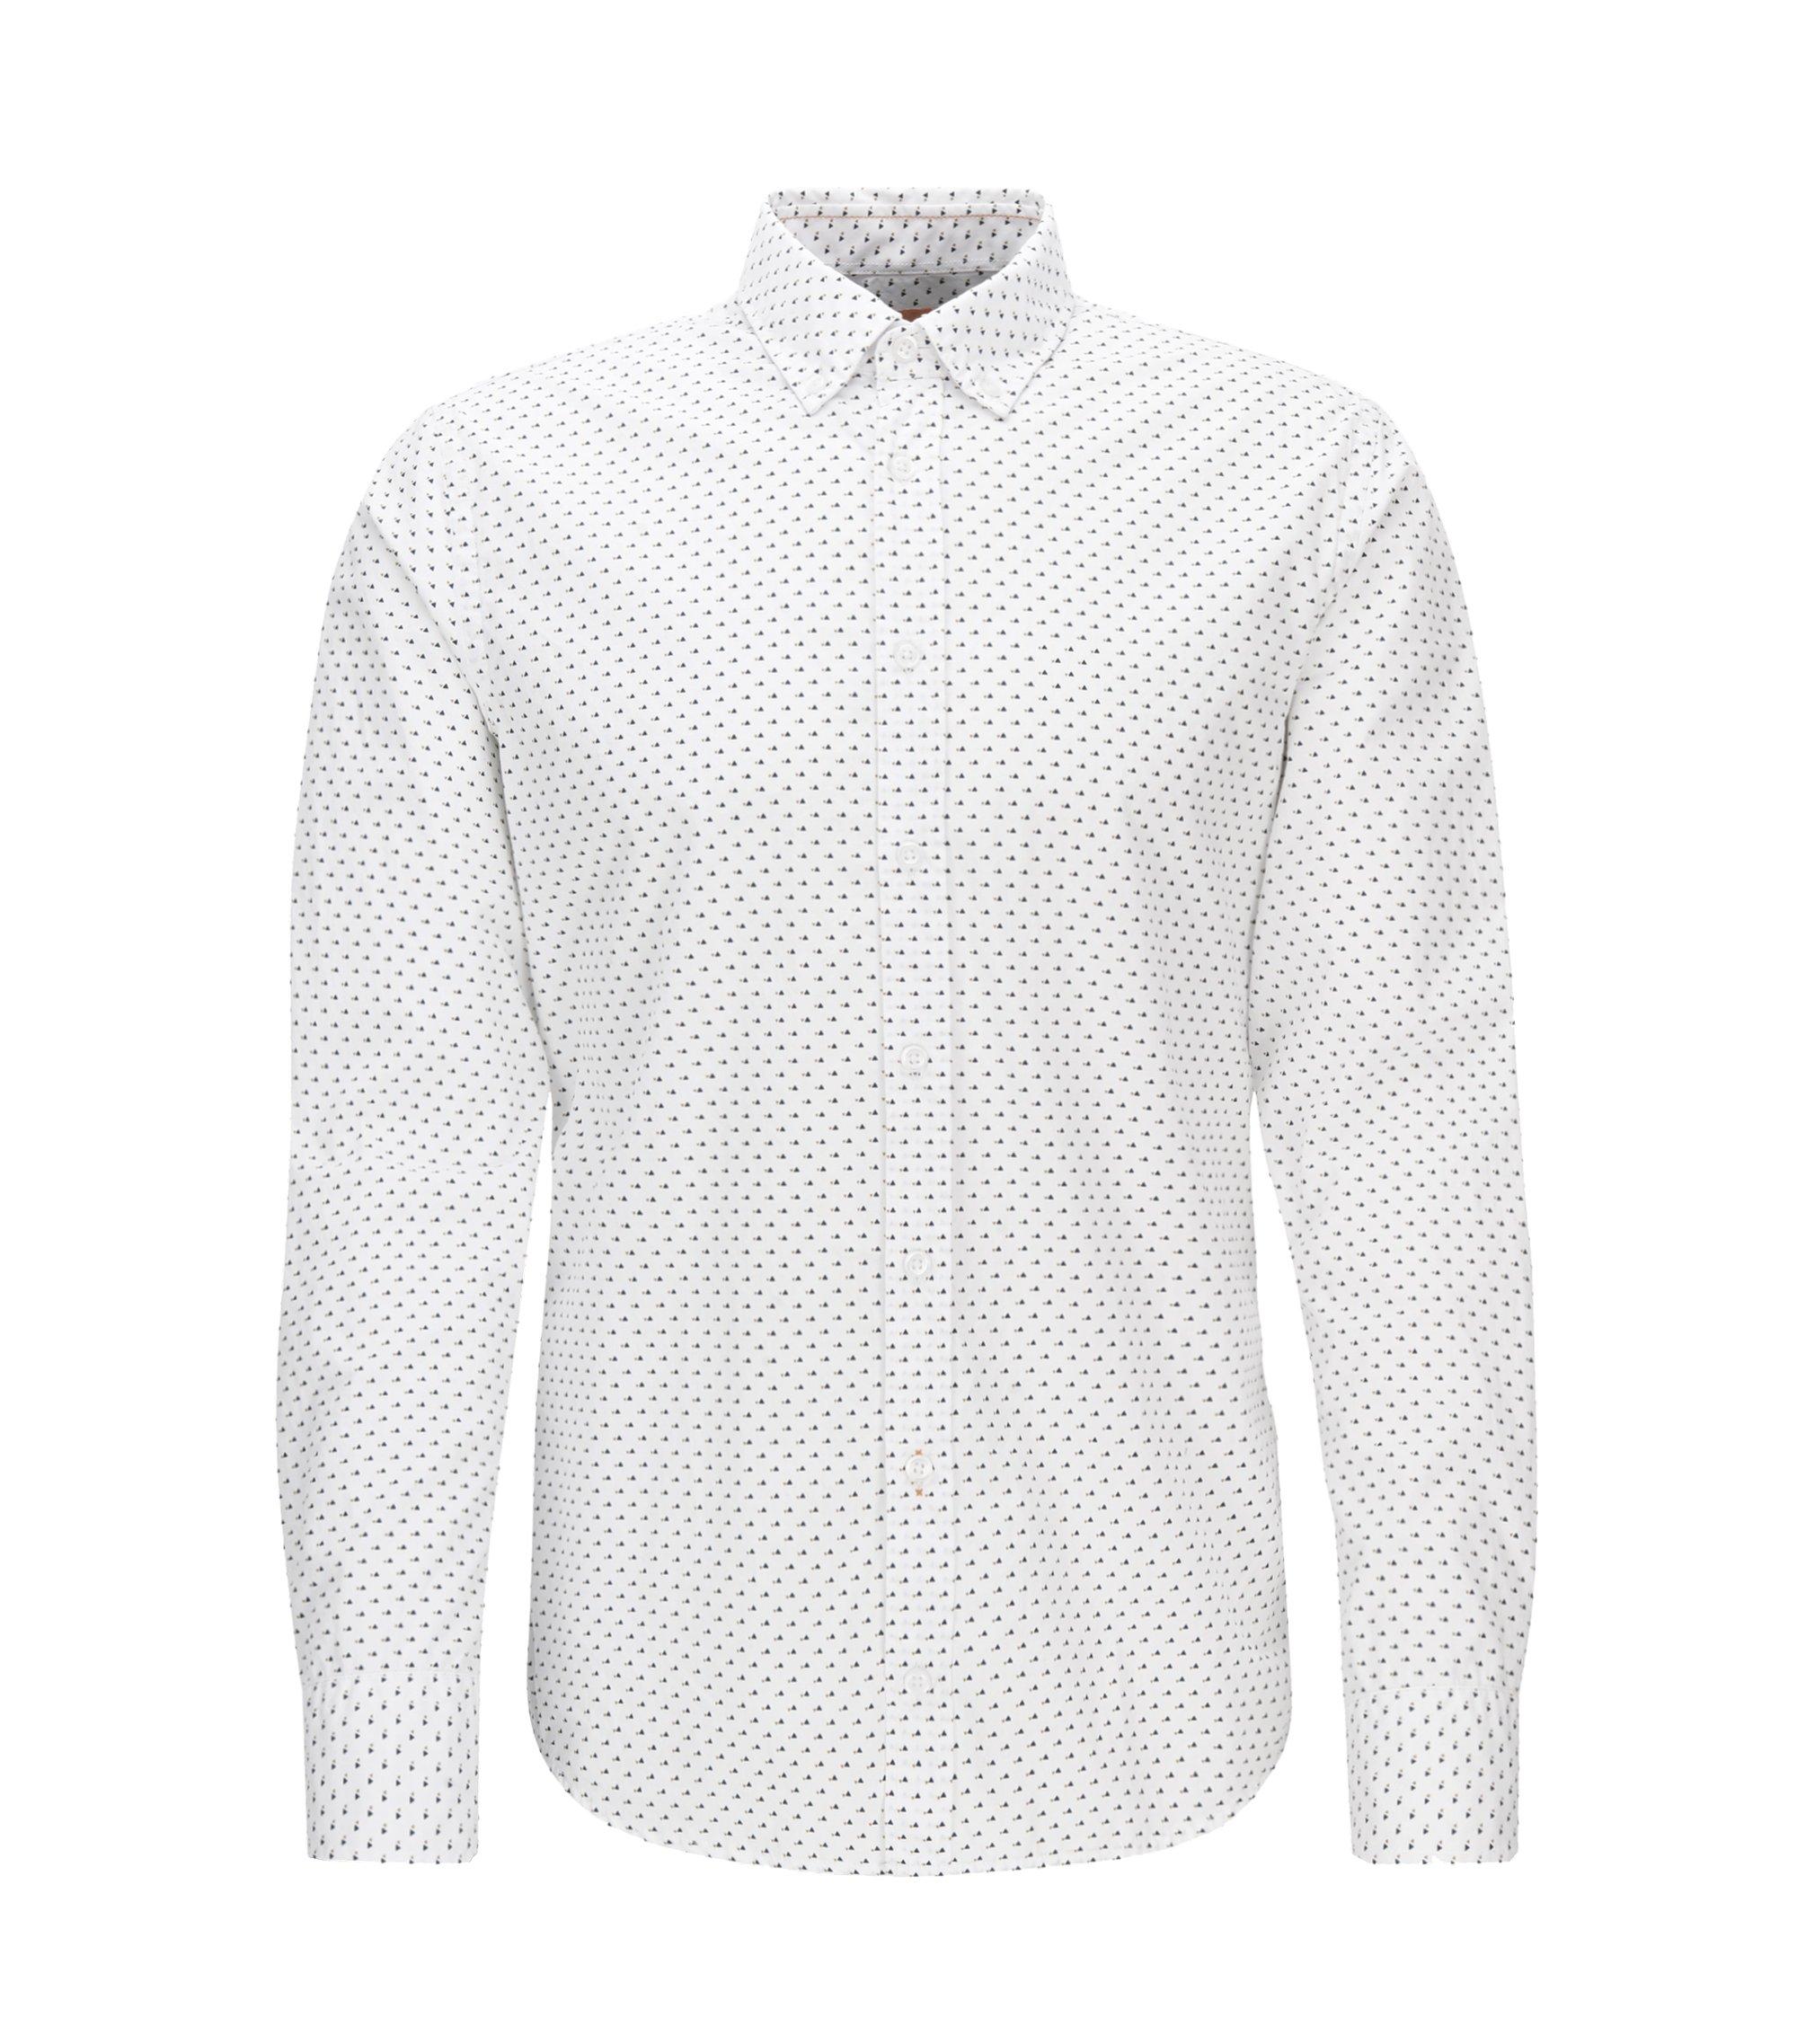 Geometric Cotton Button Down Shirt, Slim Fit | Epreppy, White